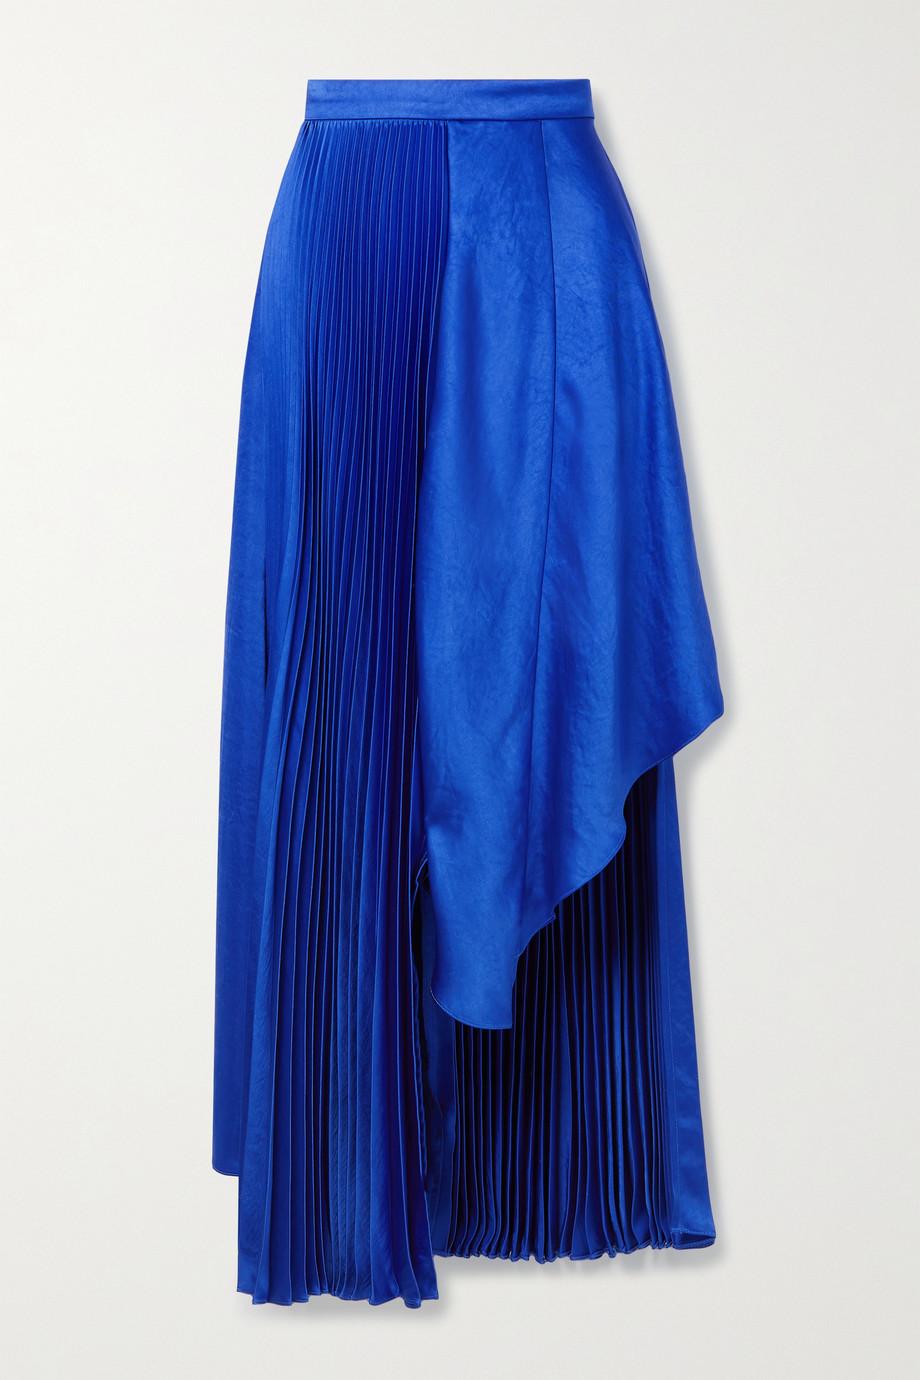 Christopher John Rogers Asymmetric pleated satin skirt